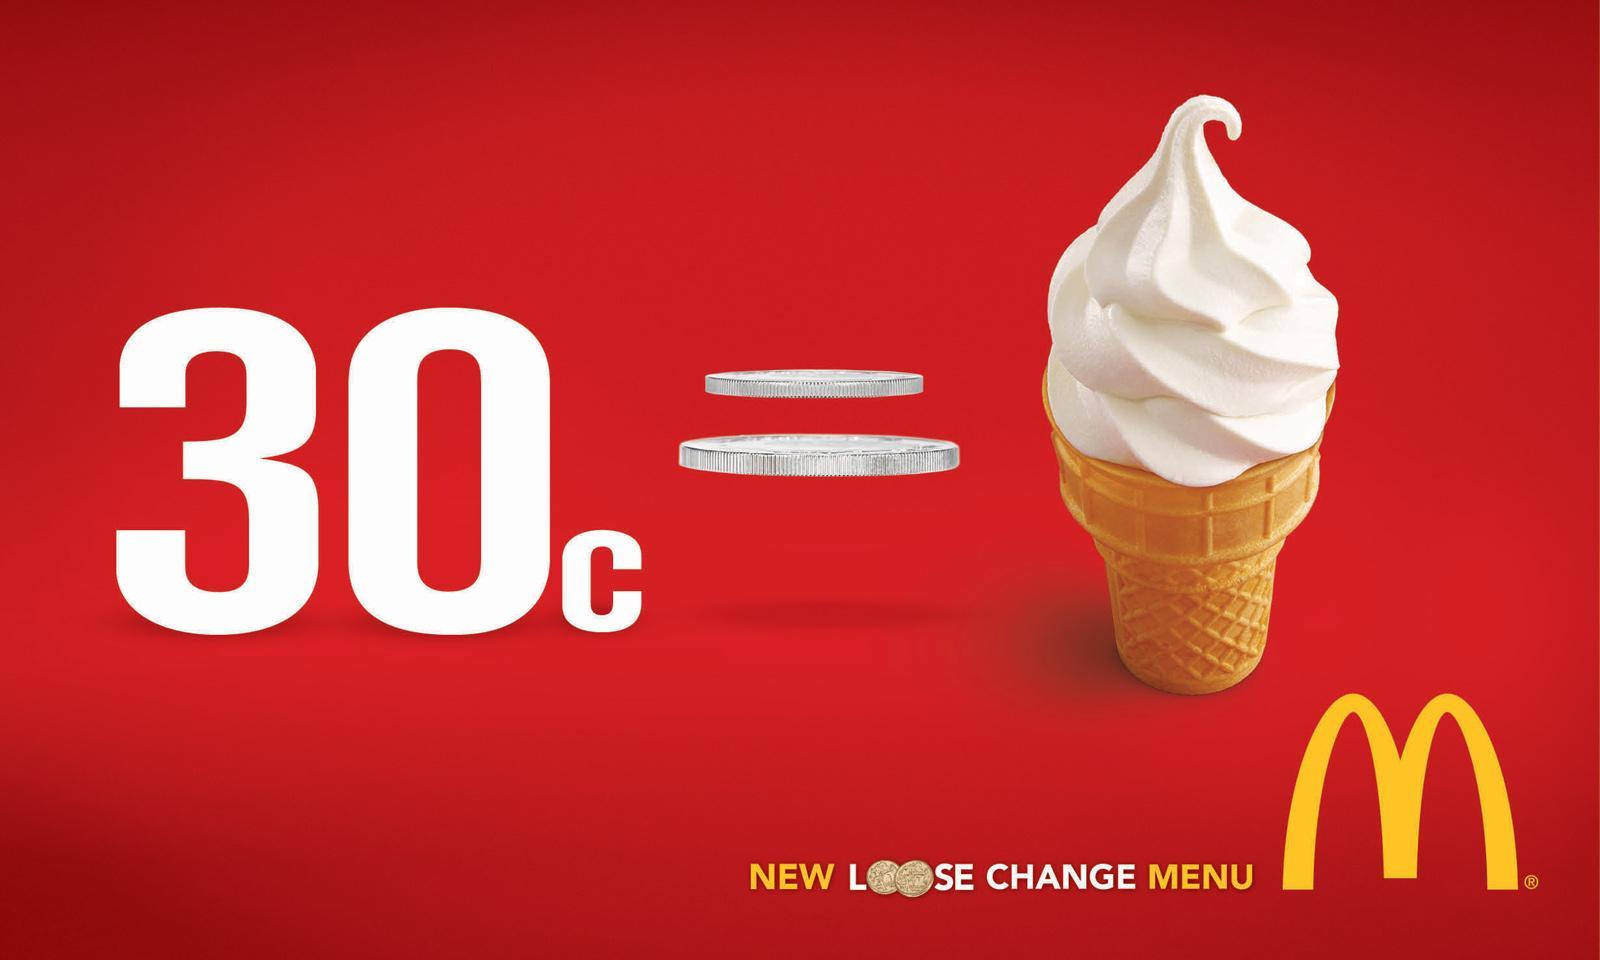 McDonald's Print Ad -  Loose Change, 2